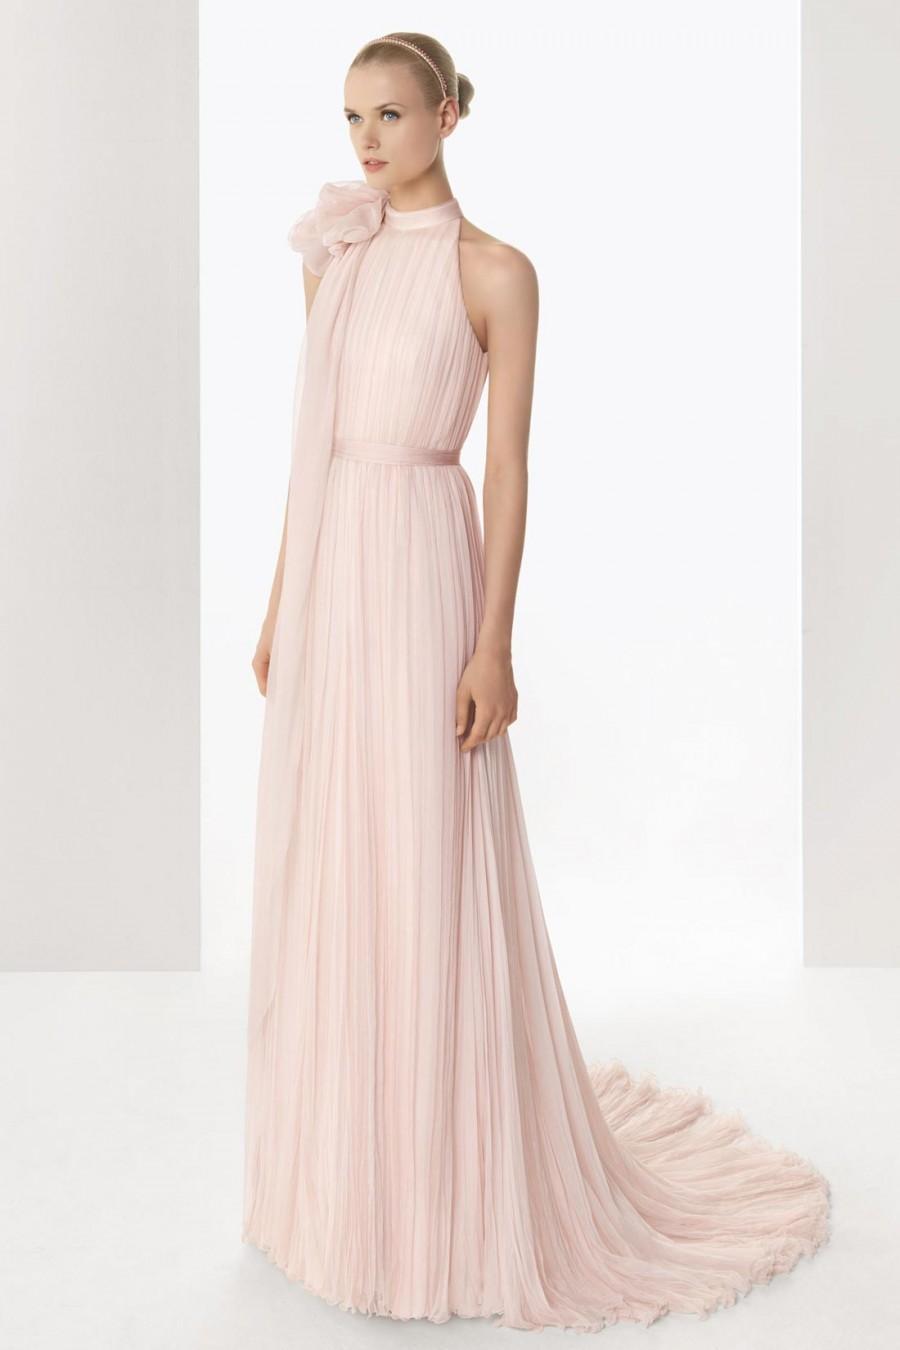 Pink Tone High Neck Bowknot Chiffon Court Train Cheap Wedding Dress ...